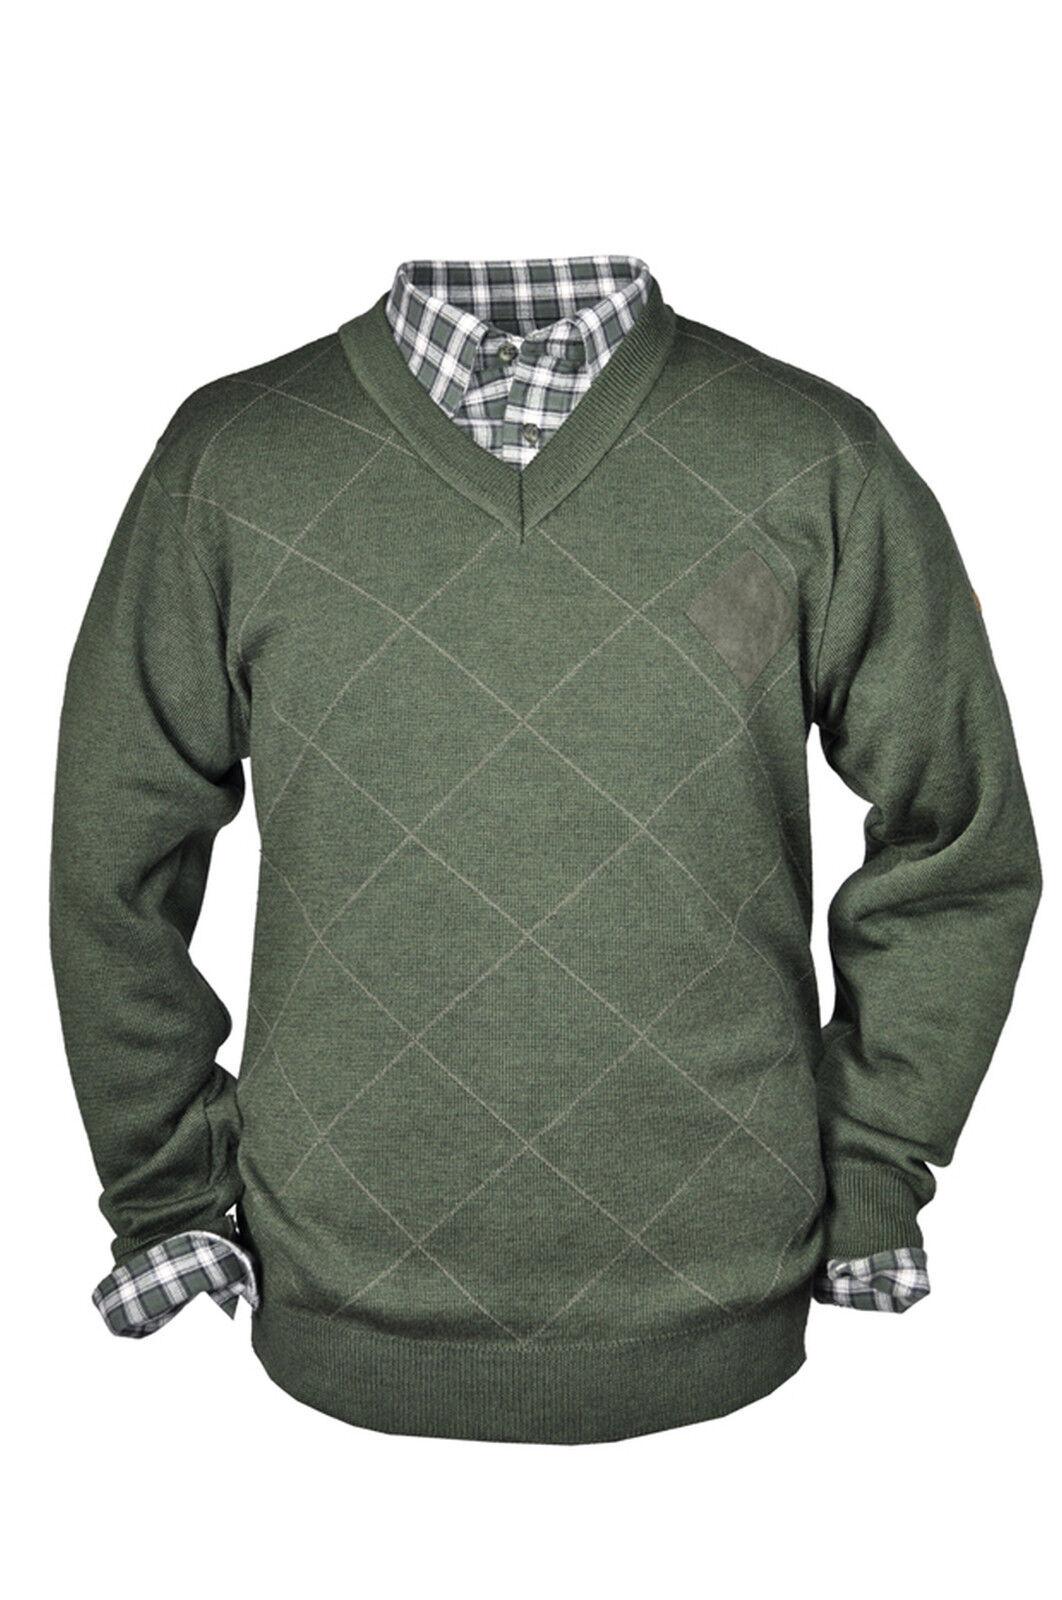 Hubertus suéter señores jersey de punto caza Jersey lana merino suéter verde oliva